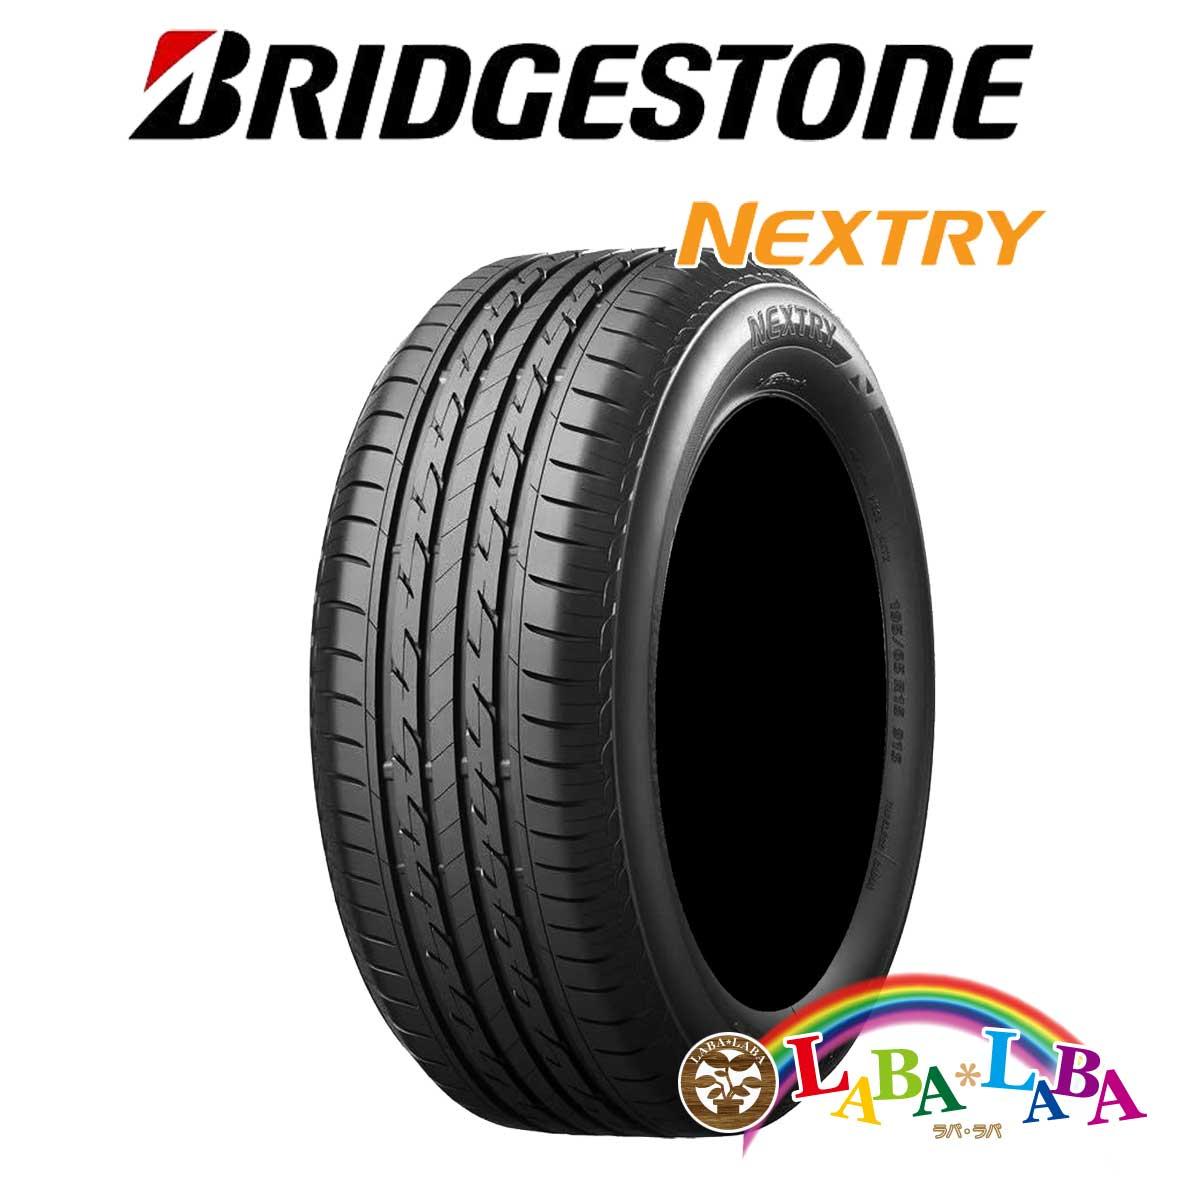 BRIDGESTONE ブリヂストン NEXTRY 165/55R14 72V サマータイヤ 4本セット